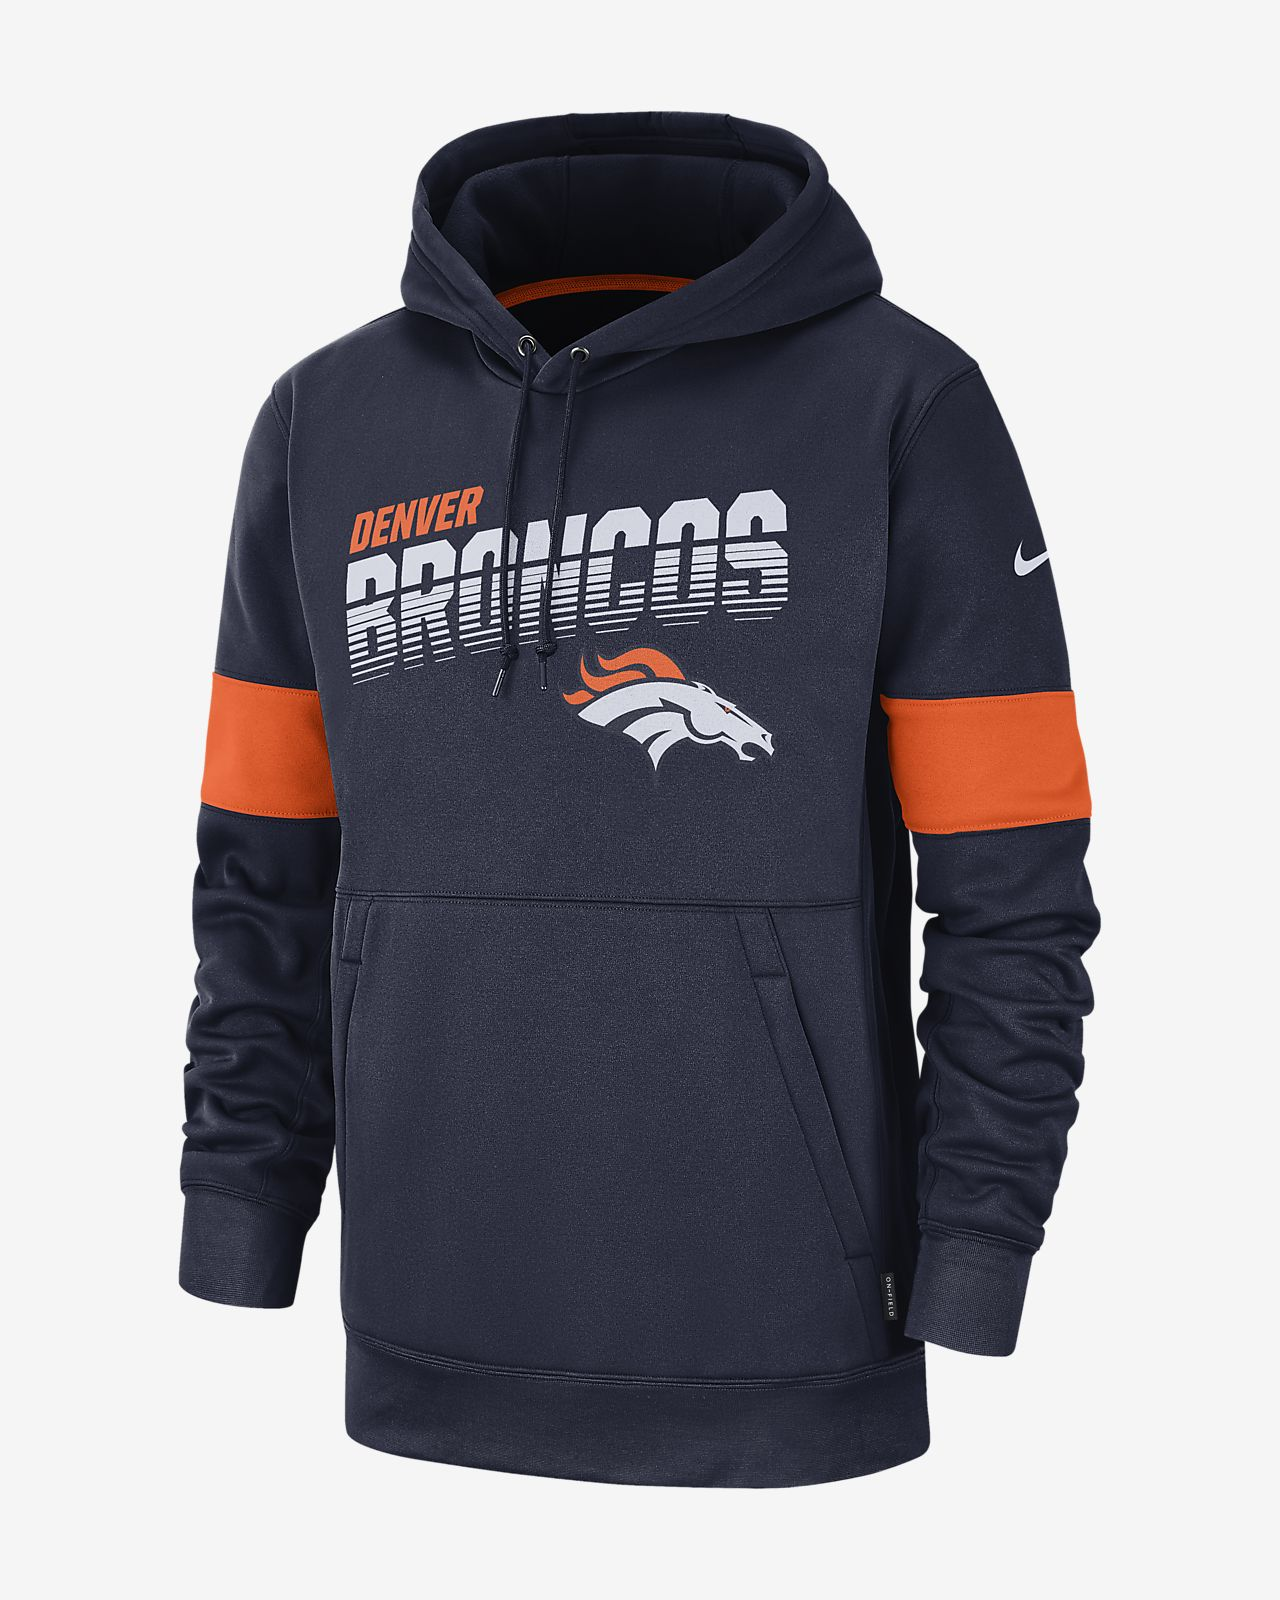 lowest price 9eb57 f8bb8 Nike Therma (NFL Broncos) Men's Hoodie